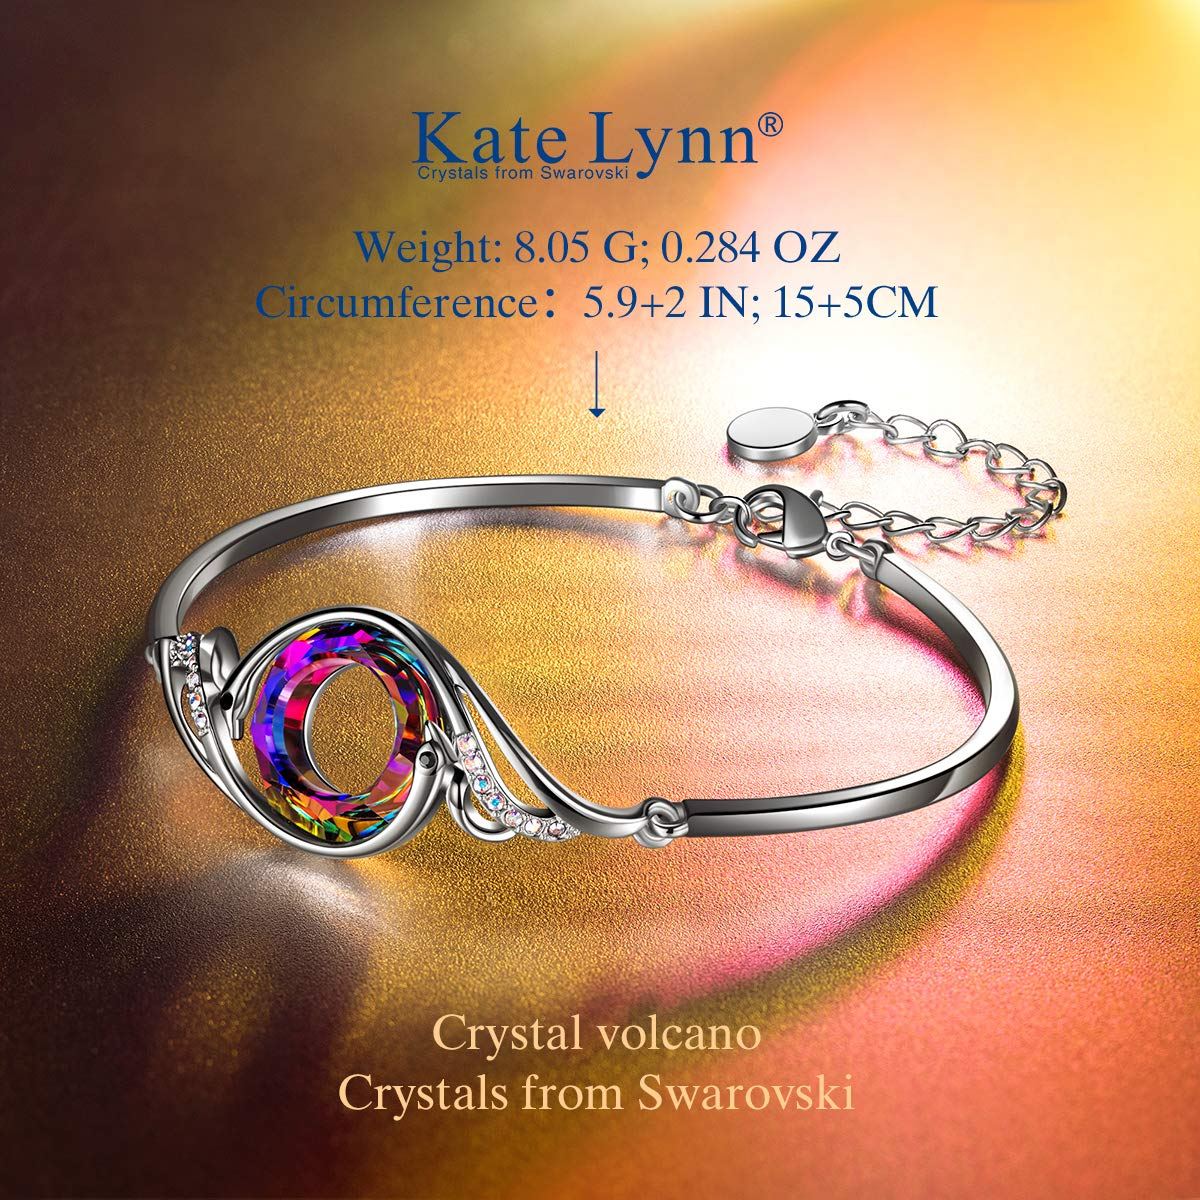 Kate Lynn Nirvana of Phoenix Bracelets for Women, Crystals from Swarovski with an Elegant Jewelry Box, Soft Cloth